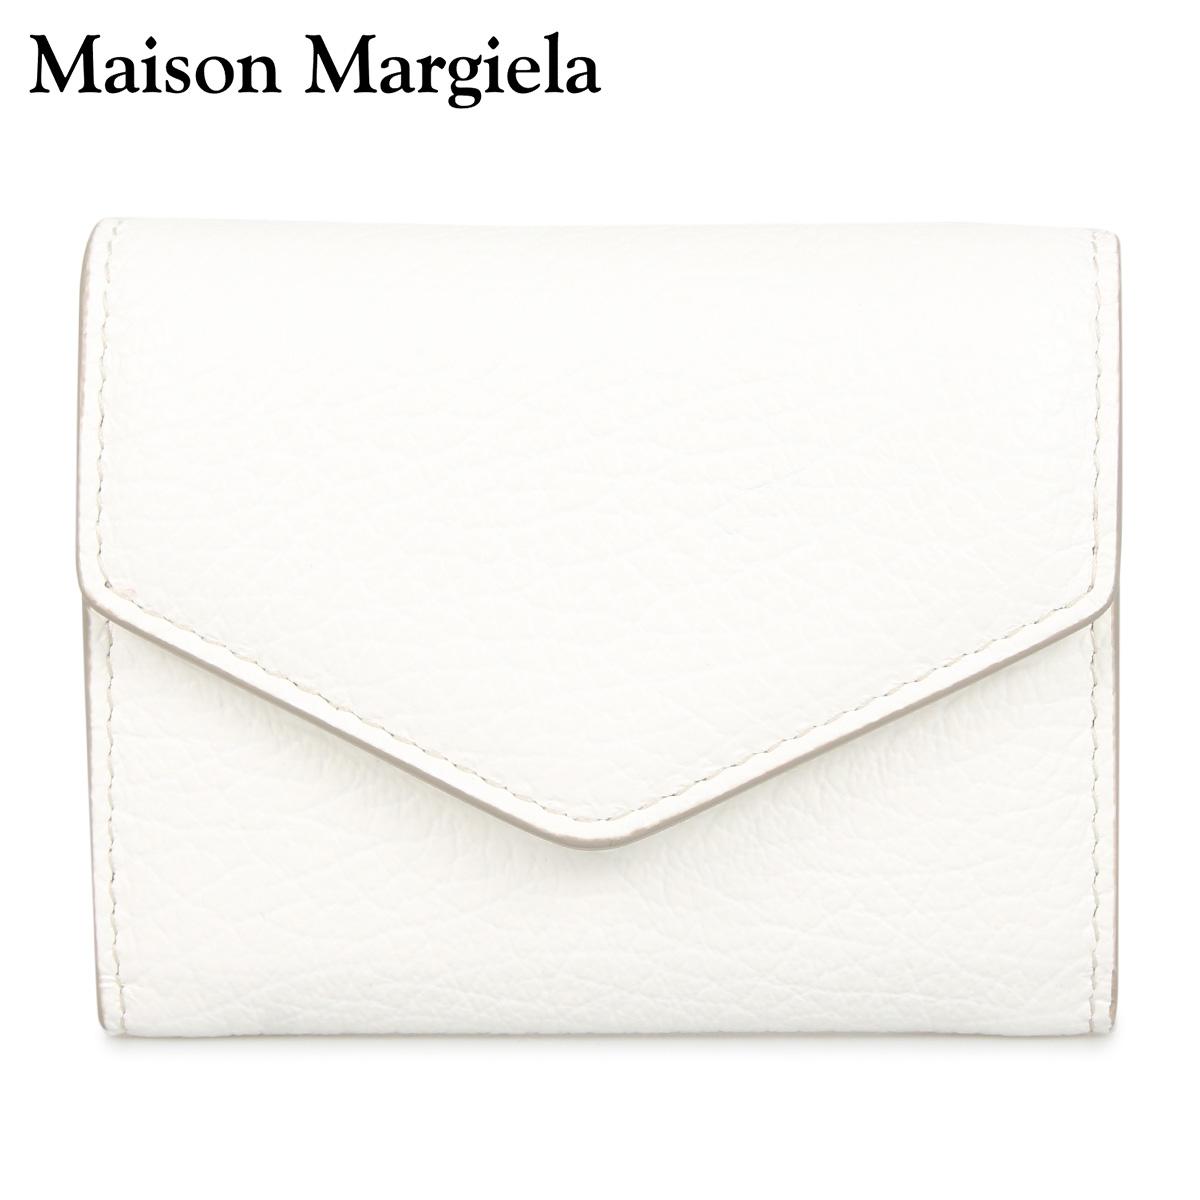 MAISON MARGIELA メゾンマルジェラ 財布 ミニ財布 メンズ レディース WALLET ホワイト 白 S56UI0149 [3/12 新入荷]